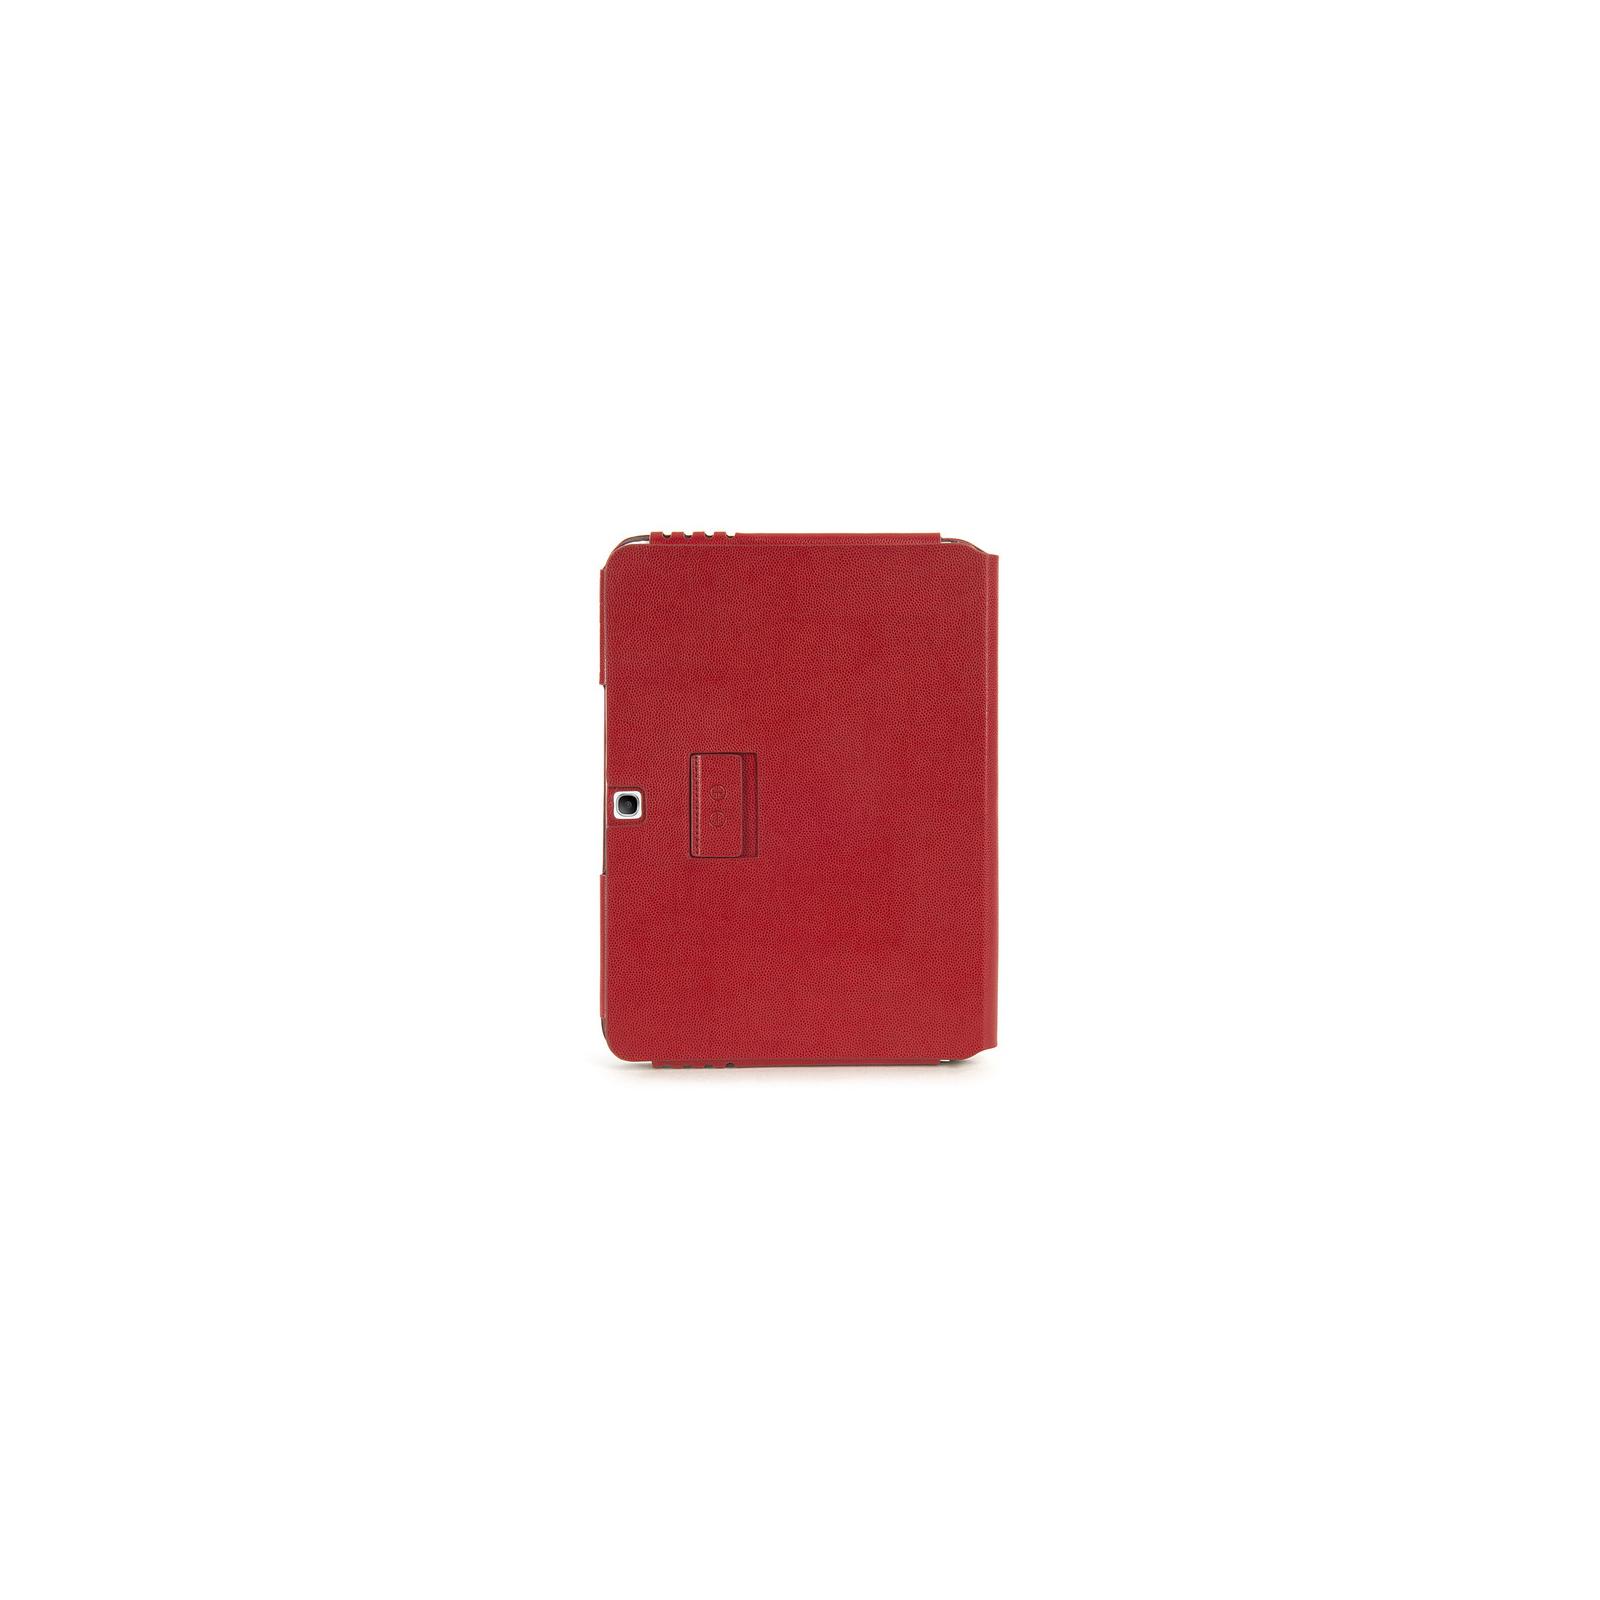 Чехол для планшета Tucano Galaxy Tab 3 10.1 Leggero Red (TAB-LS310-R) изображение 3